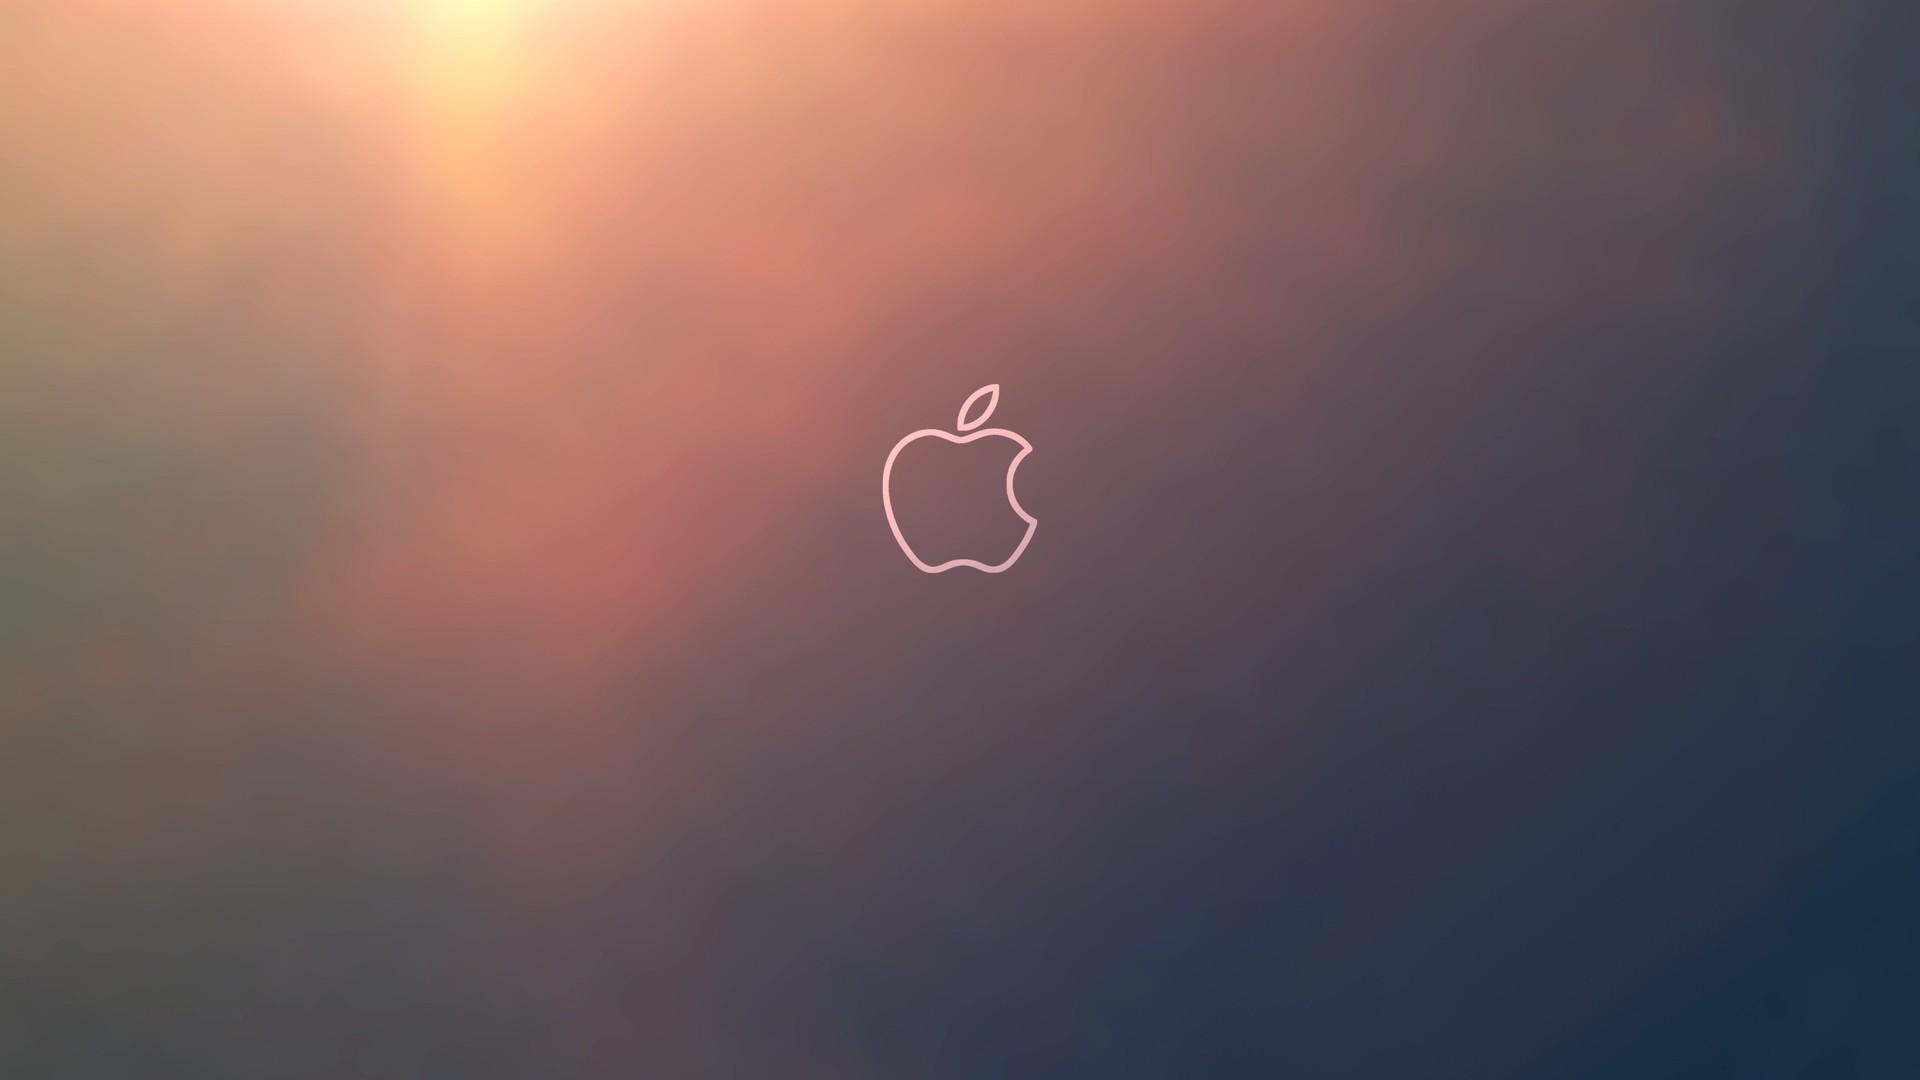 apple wallpaper ·① download free wallpapers for desktop computers